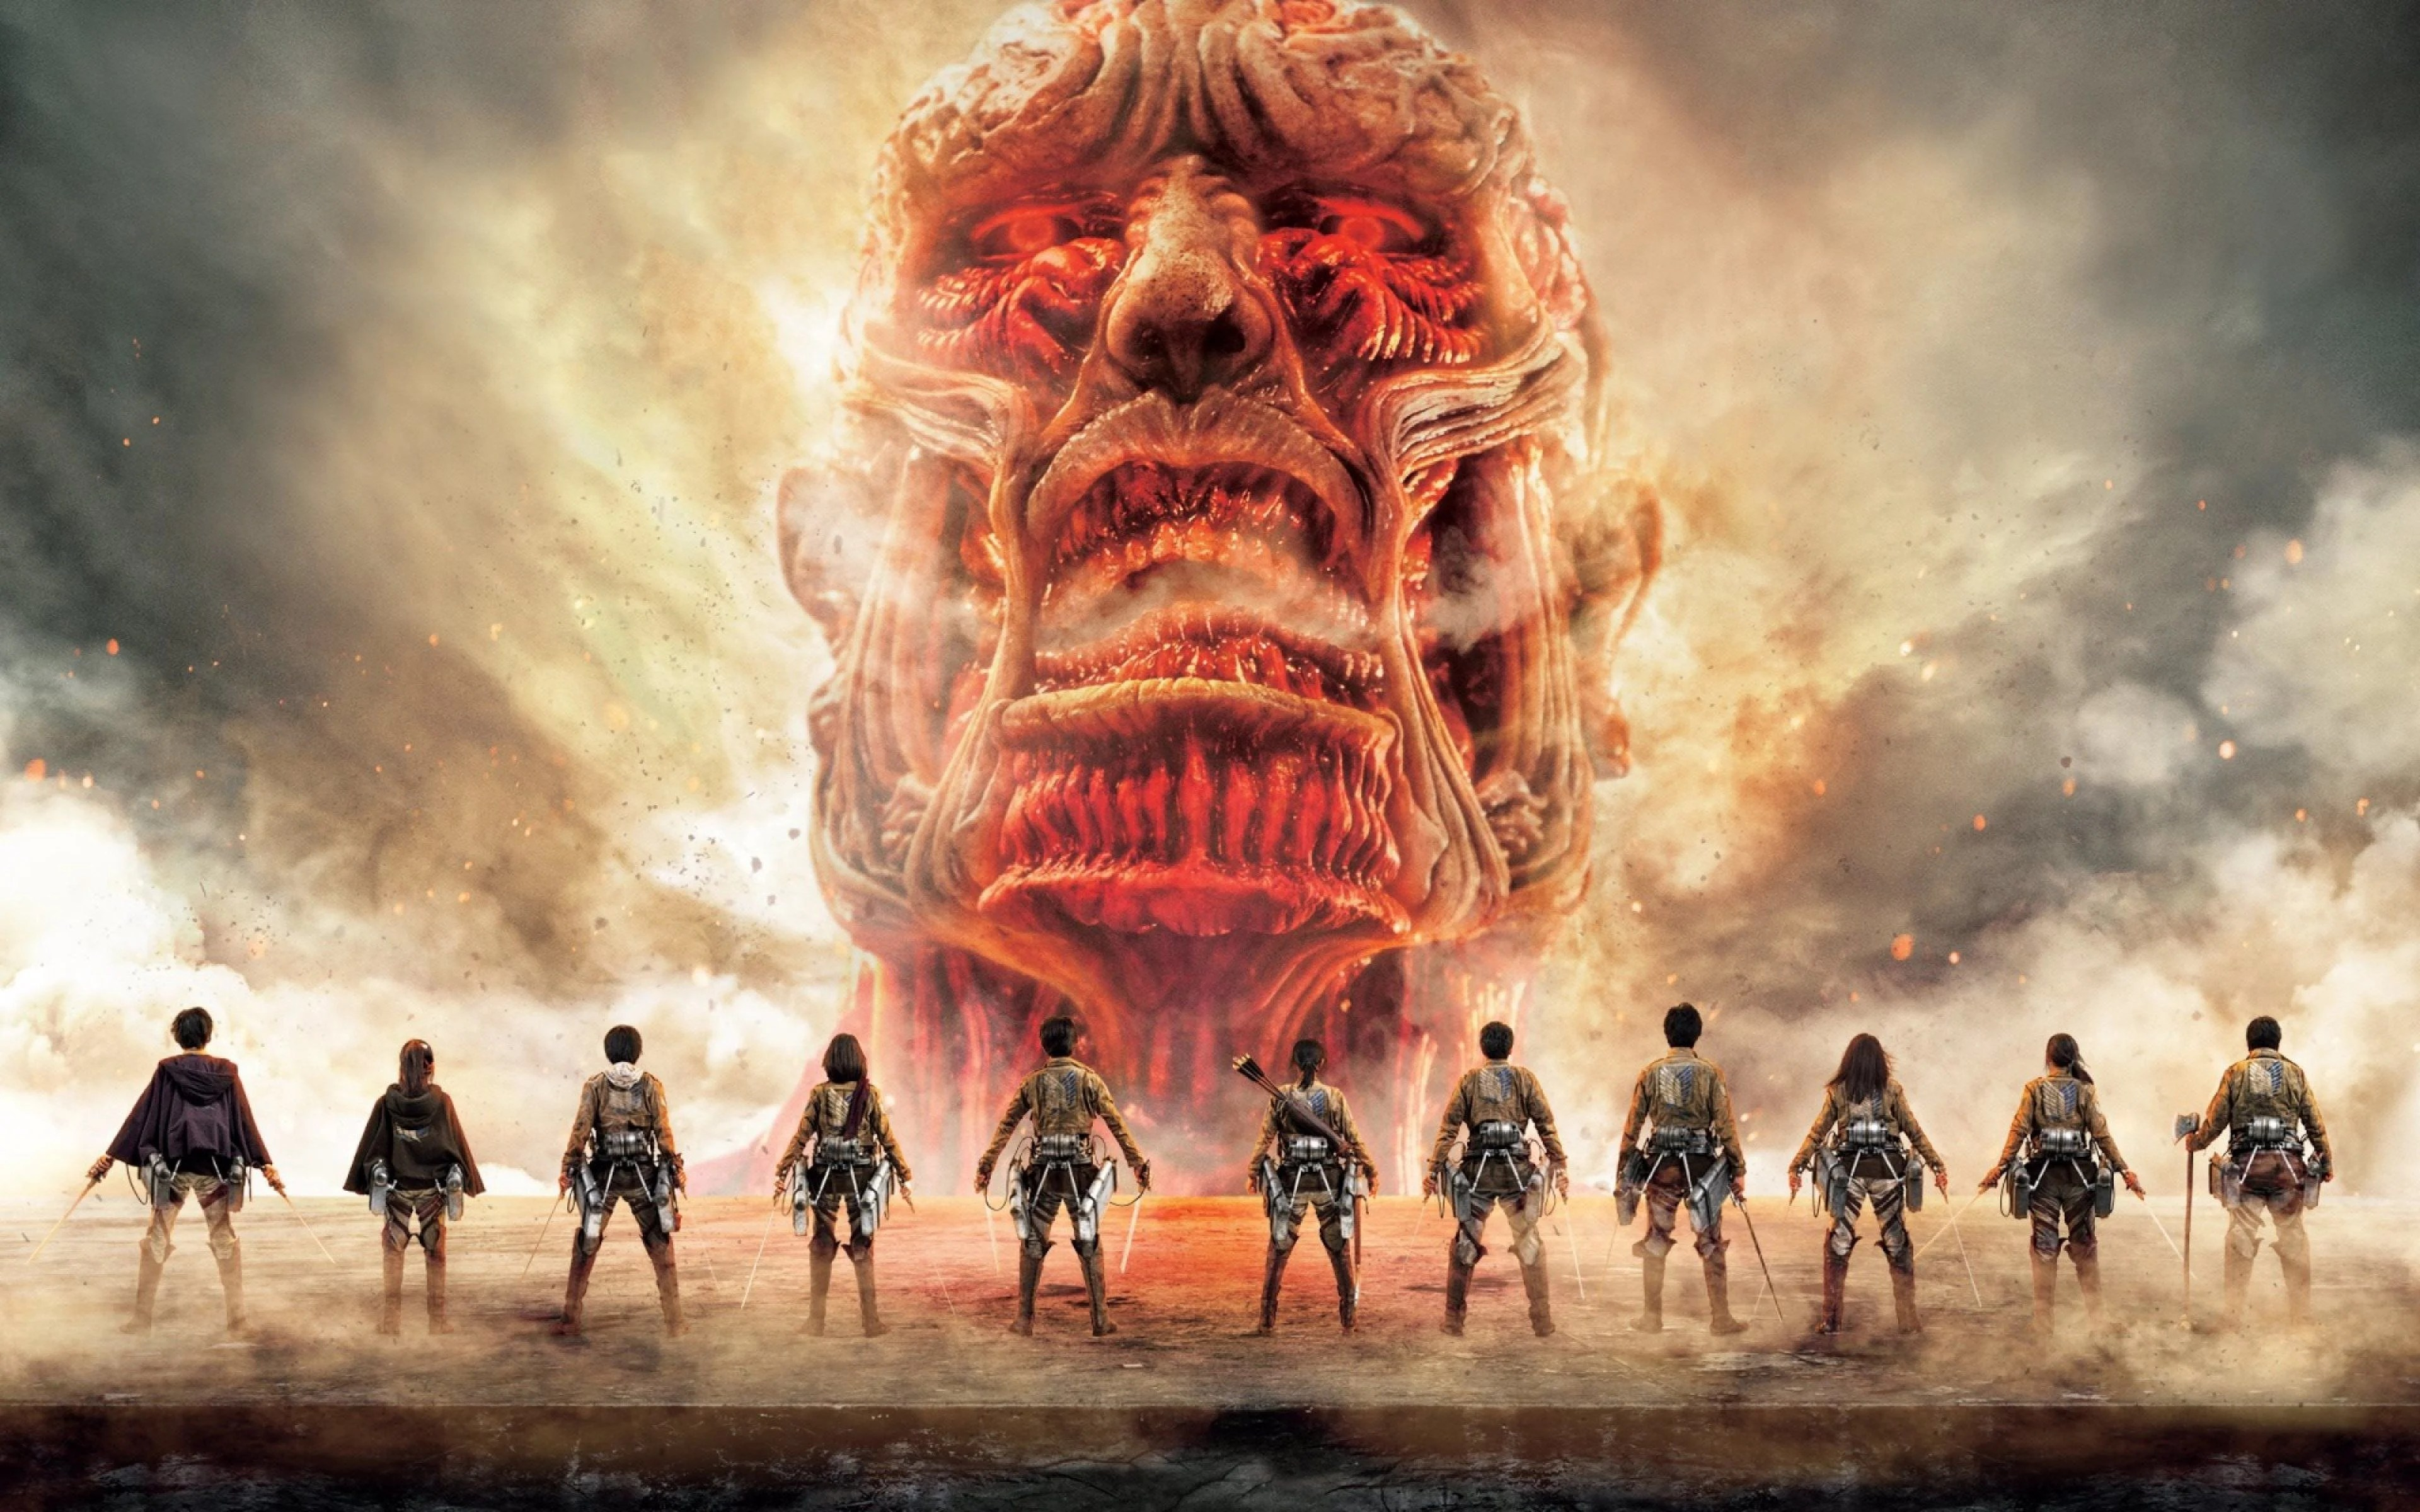 1366x768 anime attack on titan + 3d digital clock wallpaper engine. Attack On Titan Wallpapers - Top Free Attack On Titan ...